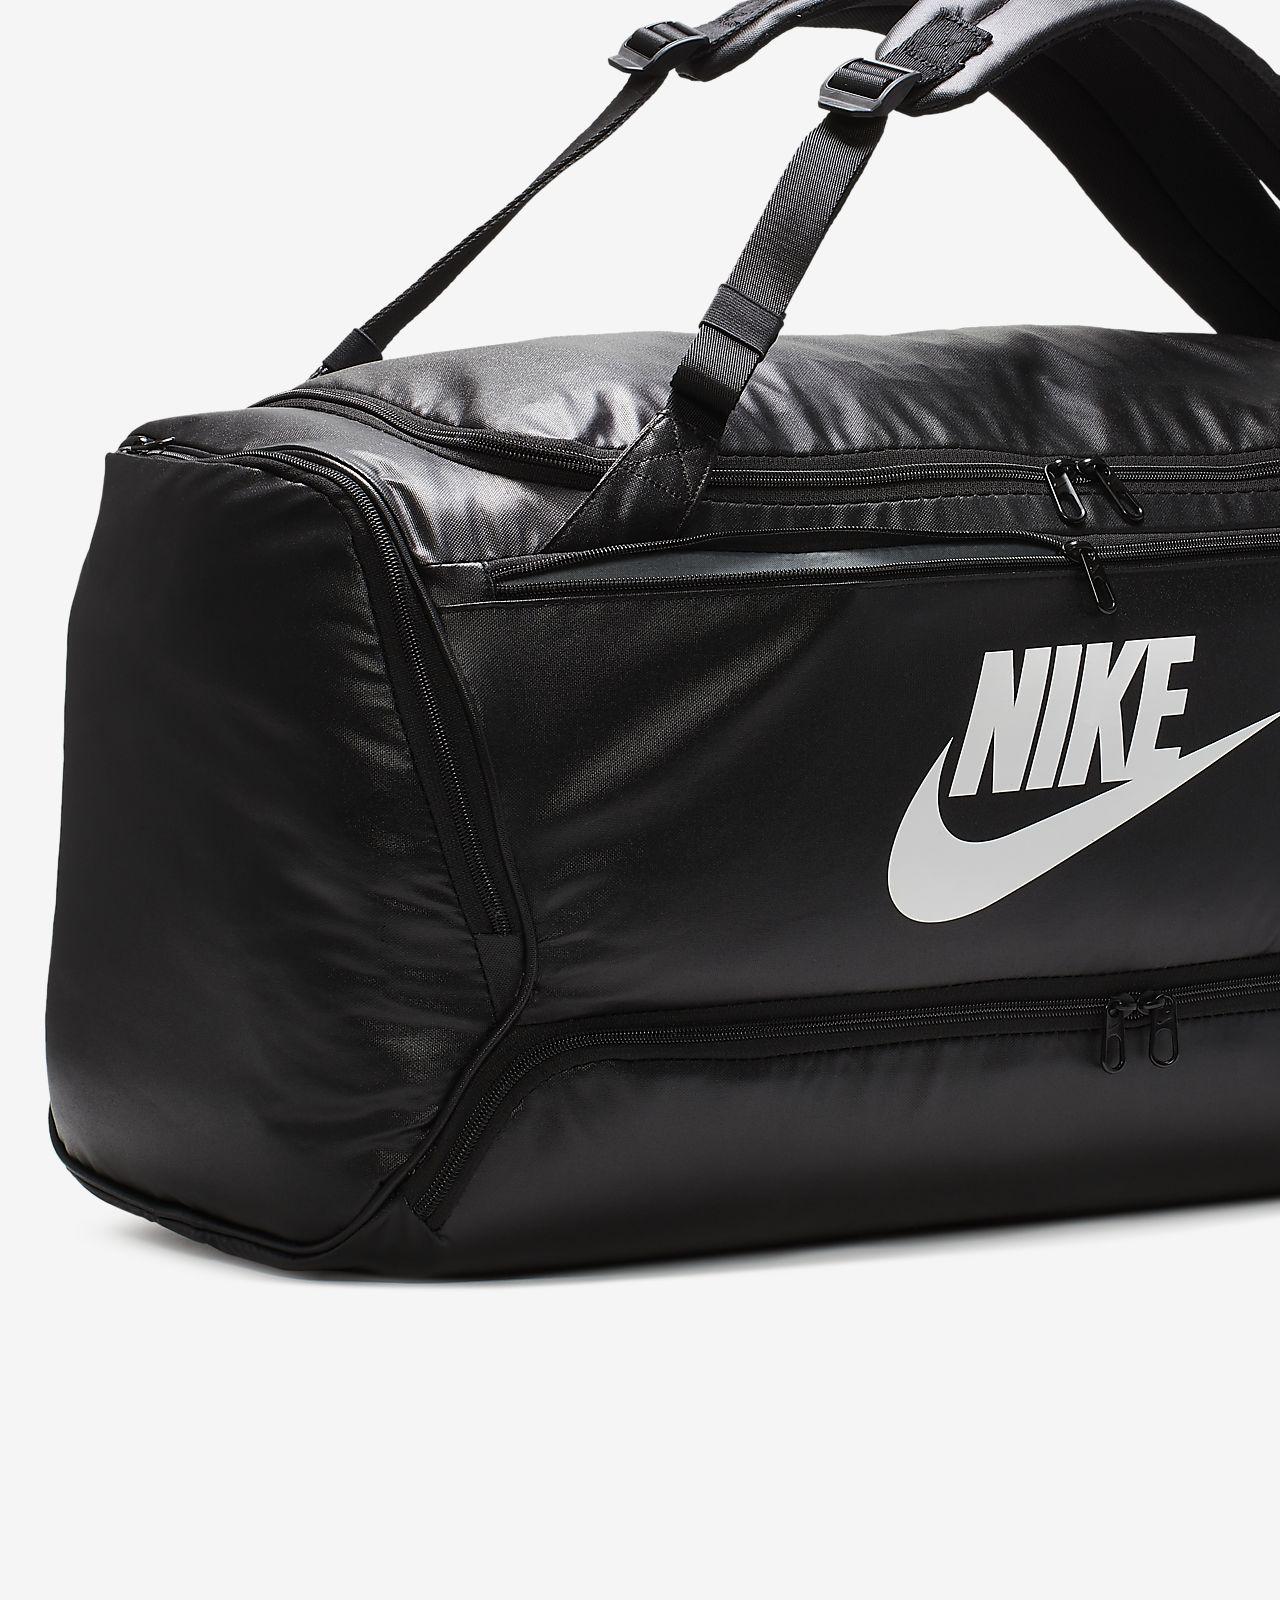 Deportemochila Bolsa Brasilia De Convertible Entrenamiento Nike 76mbfvIYgy